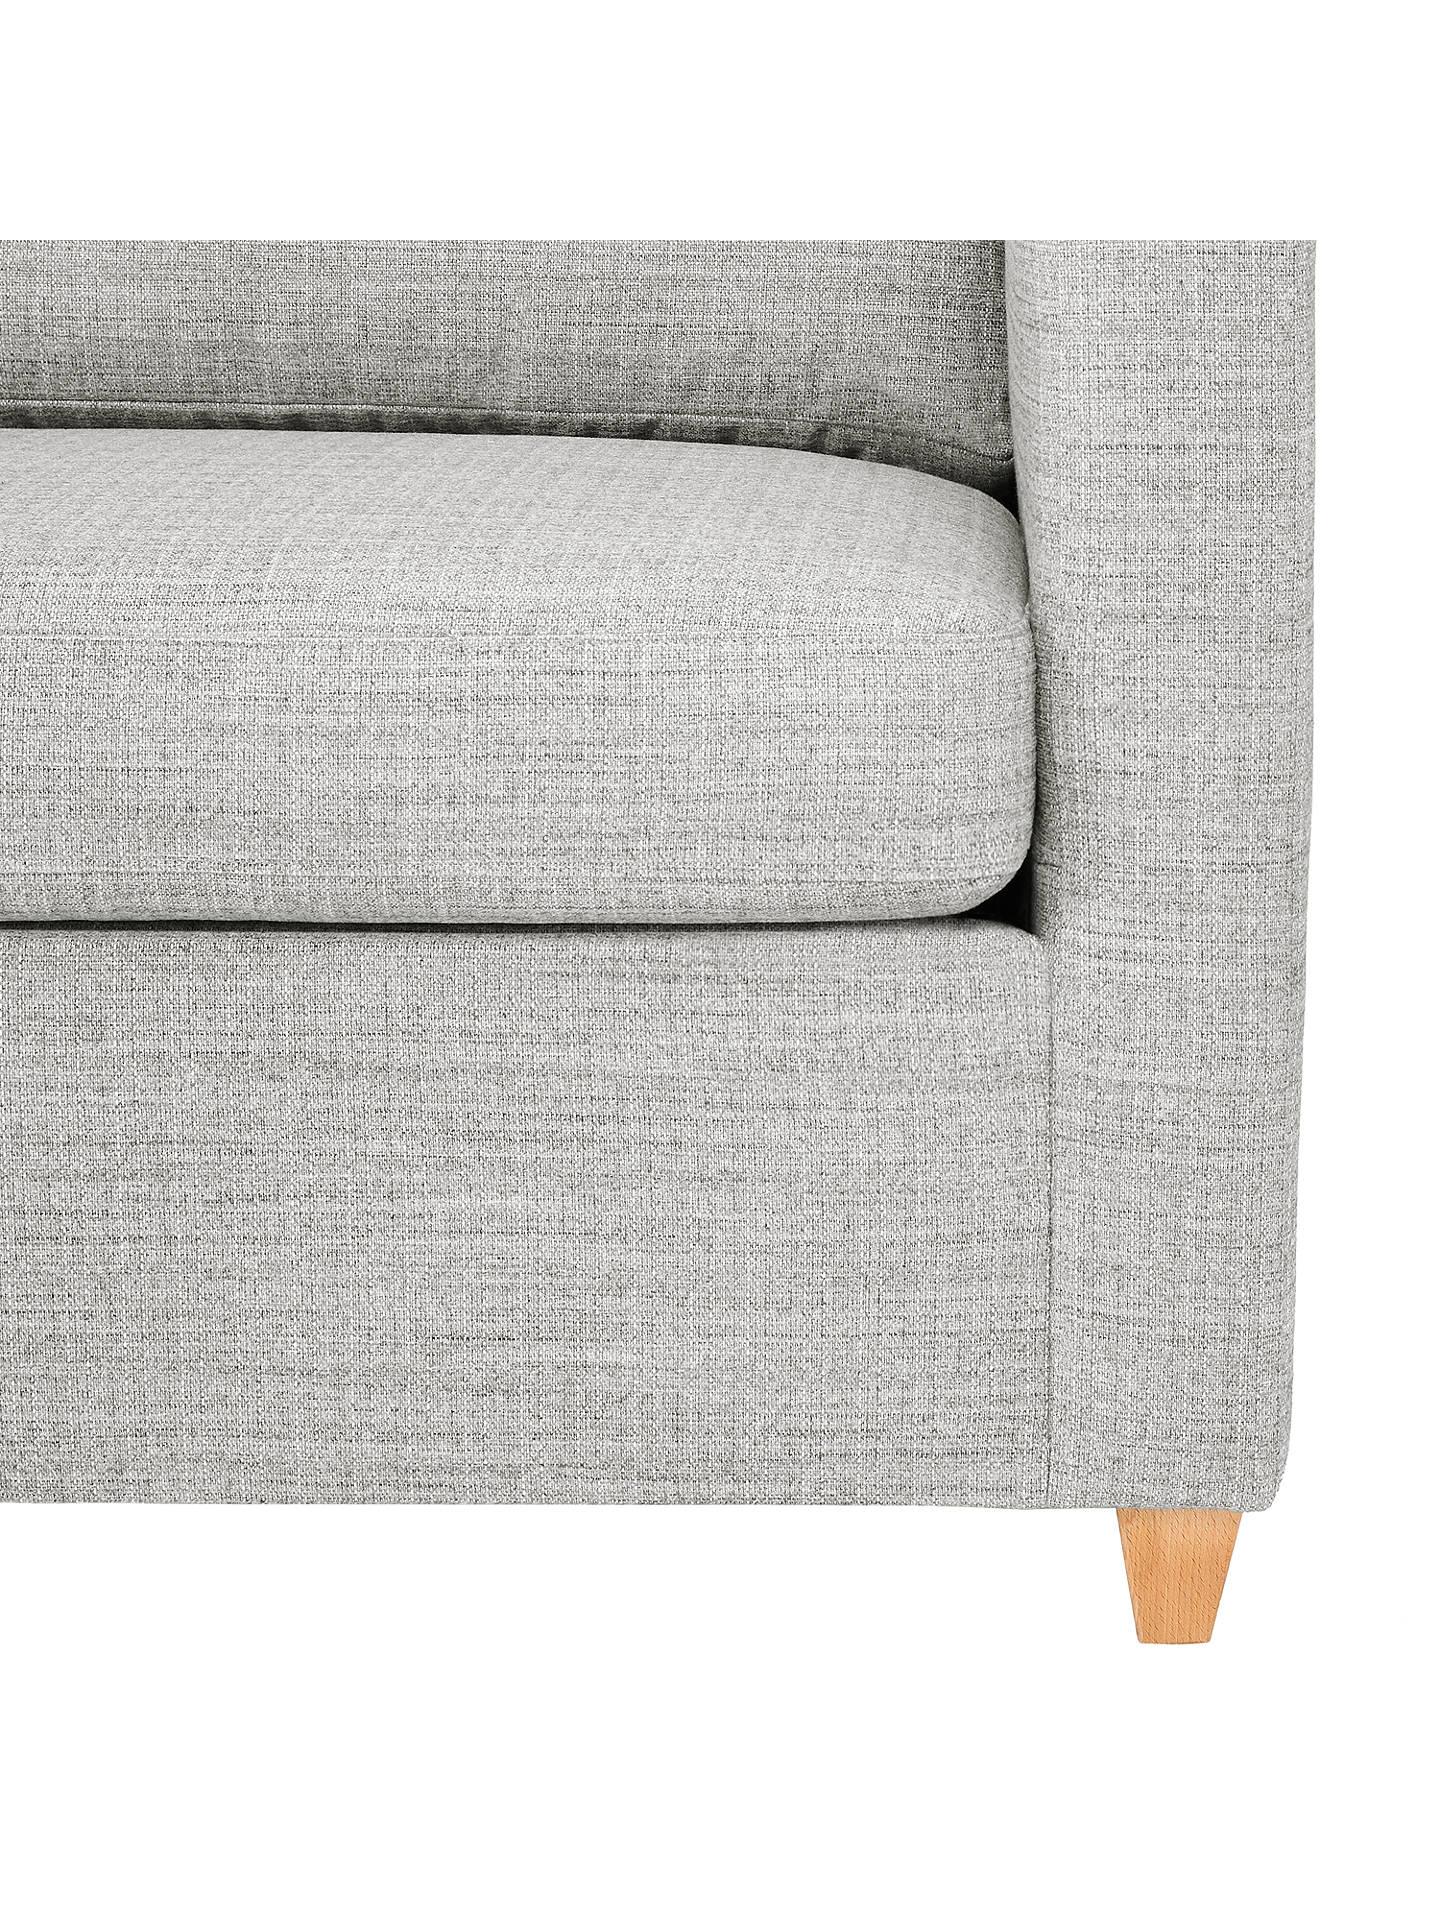 d114116b395d ... Buy John Lewis & Partners Bailey LHF Chaise End Sofa Bed Online at  johnlewis.com